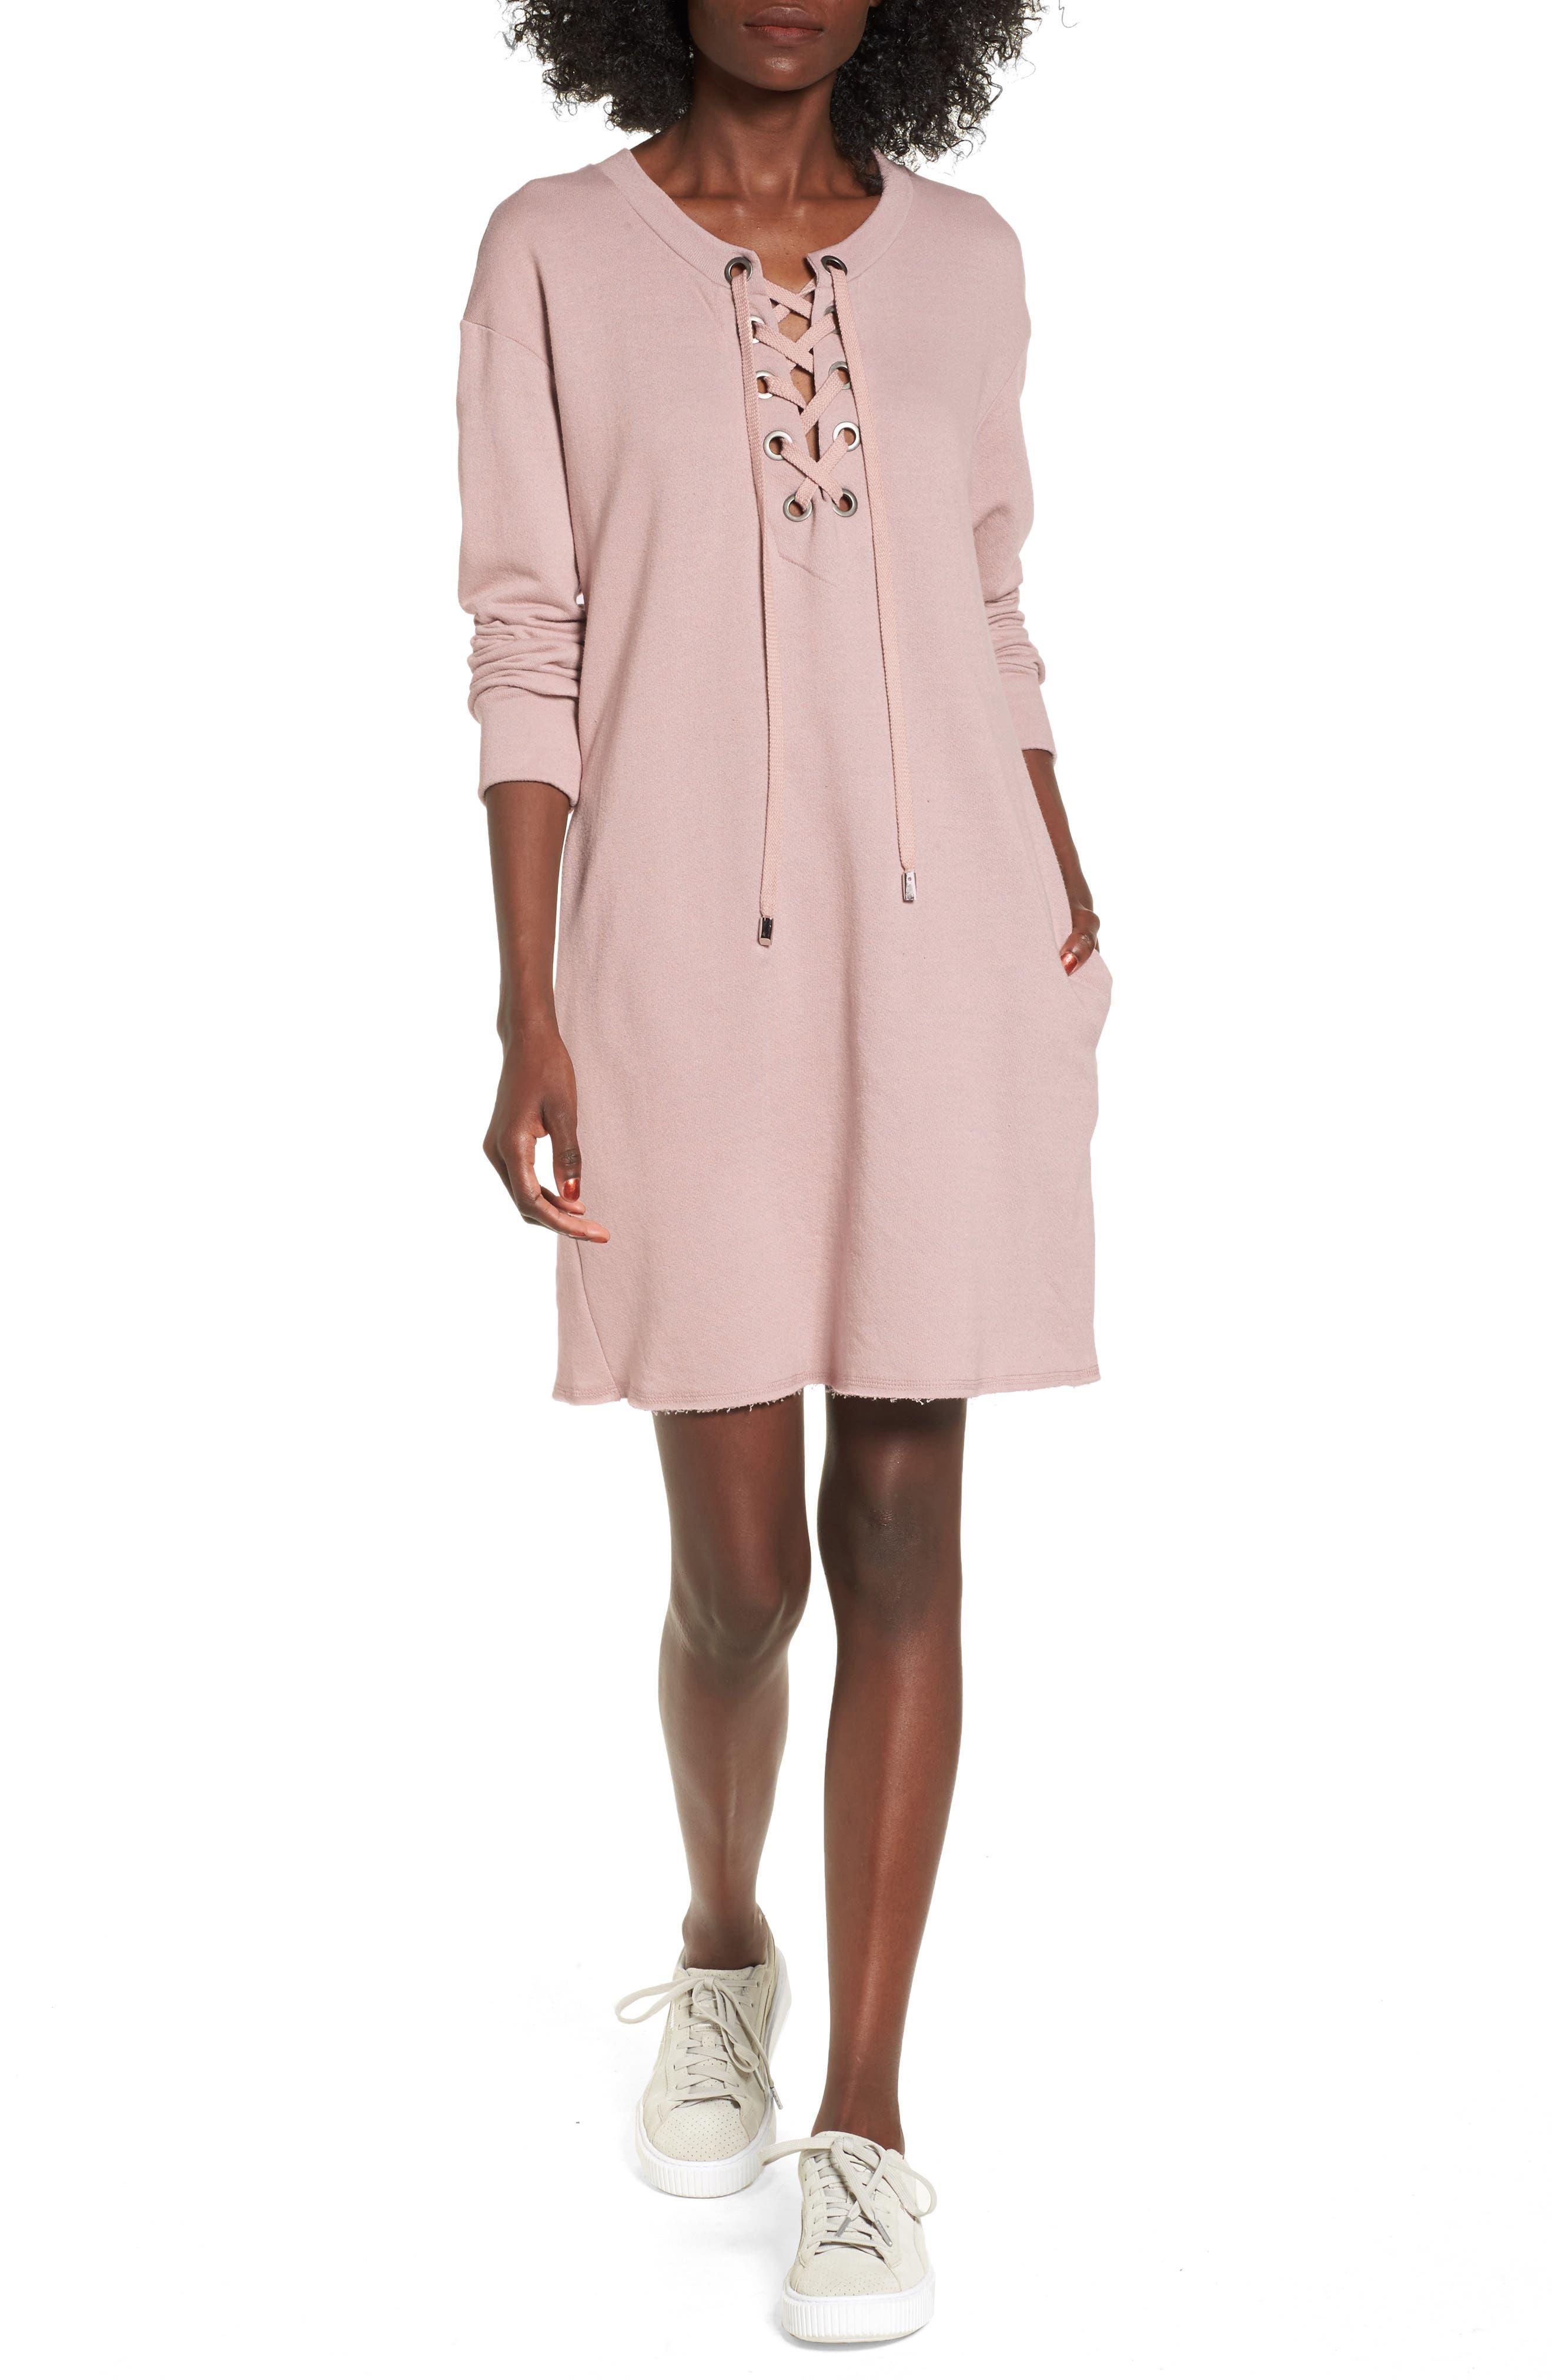 Socialite Lace-Up Sweatshirt Dress